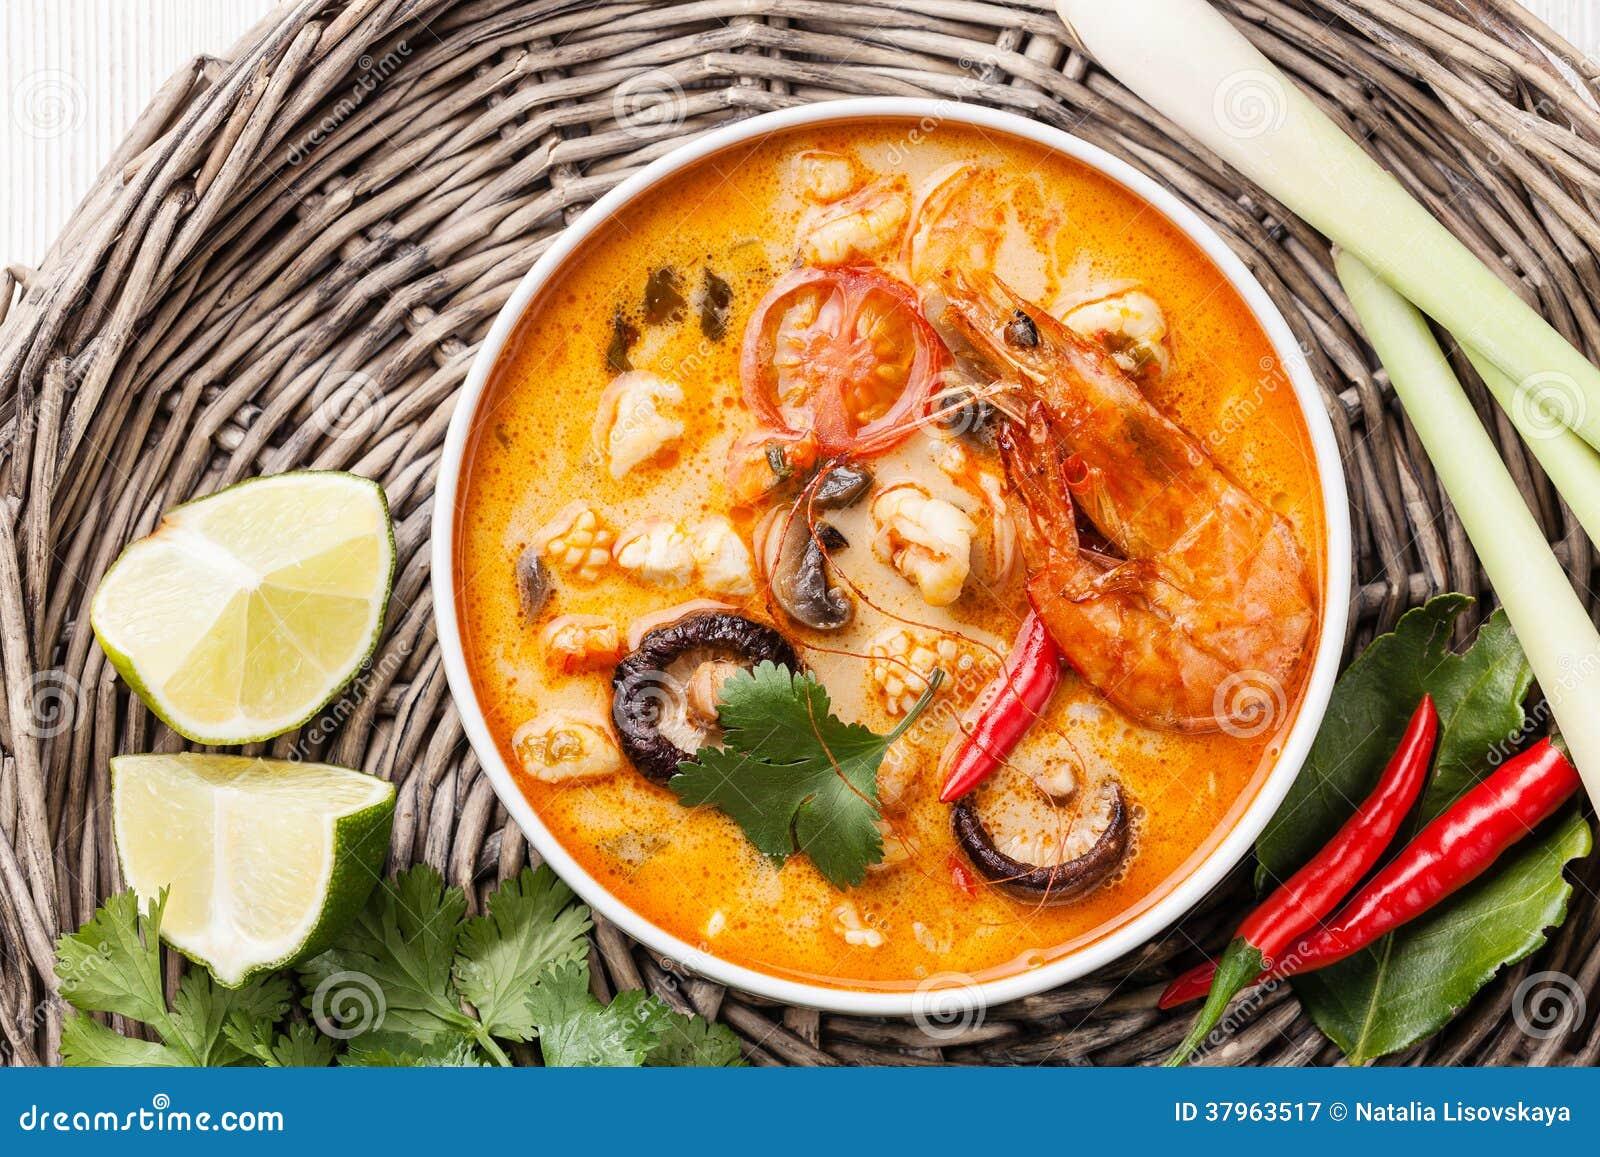 how to make thai soup tom yum soup